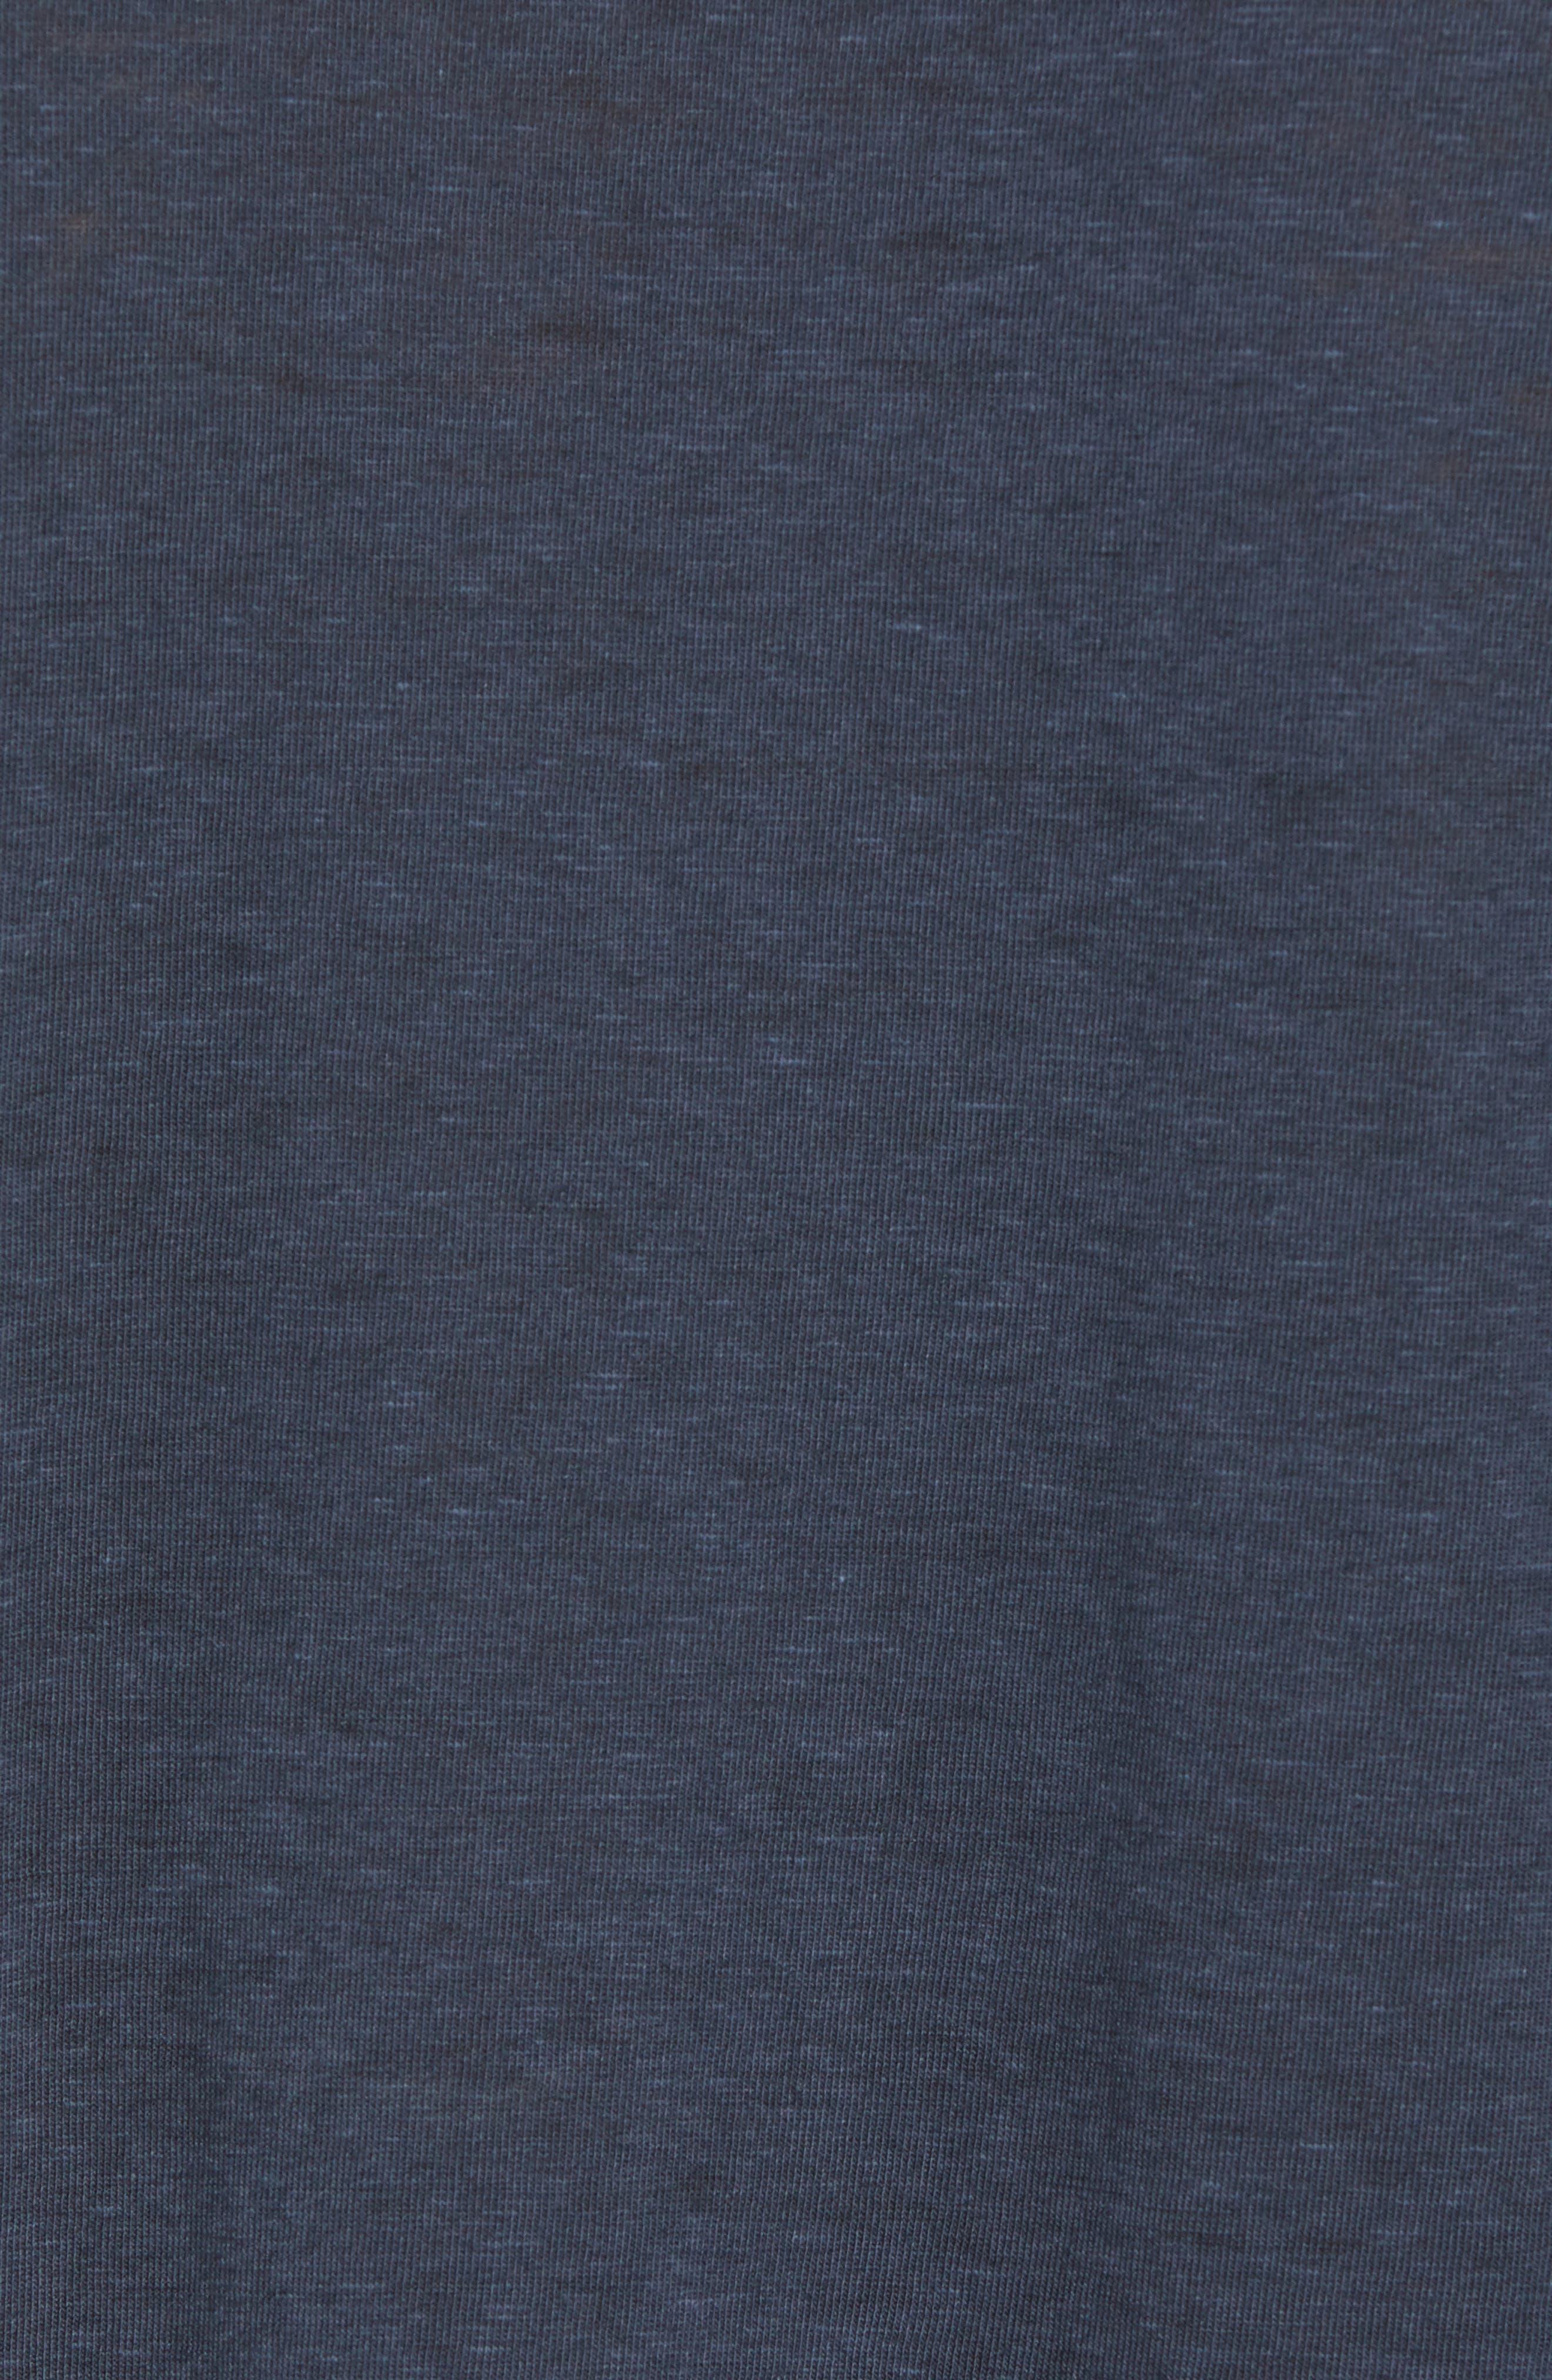 Tri-Motors Burnout T-Shirt,                             Alternate thumbnail 5, color,                             063